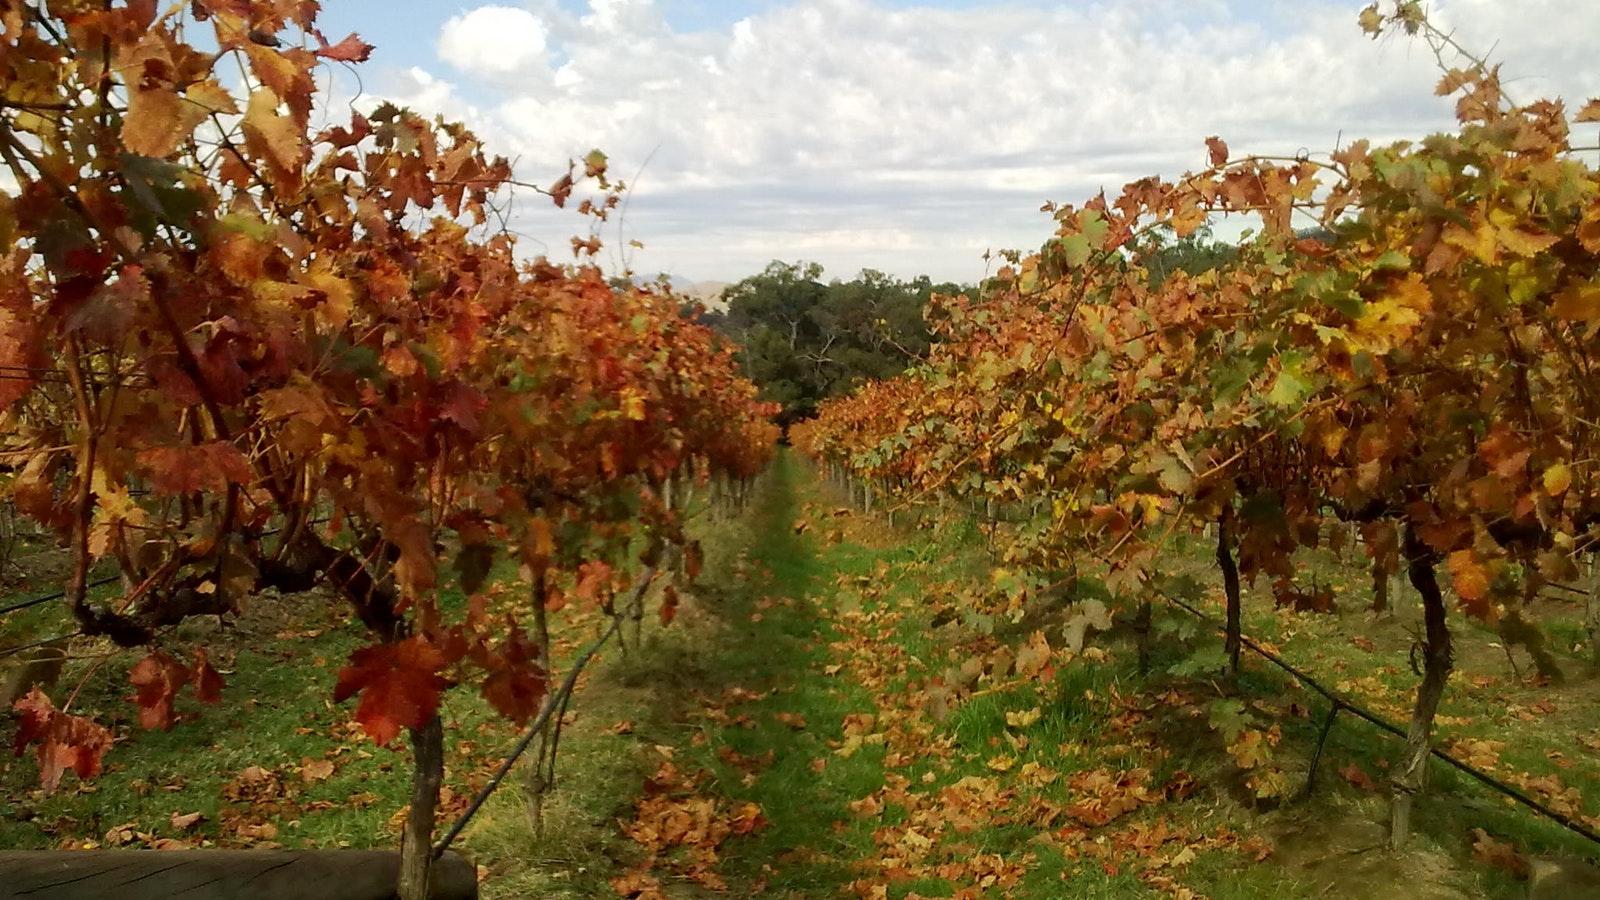 Sutherland Estate Tempranillo vines